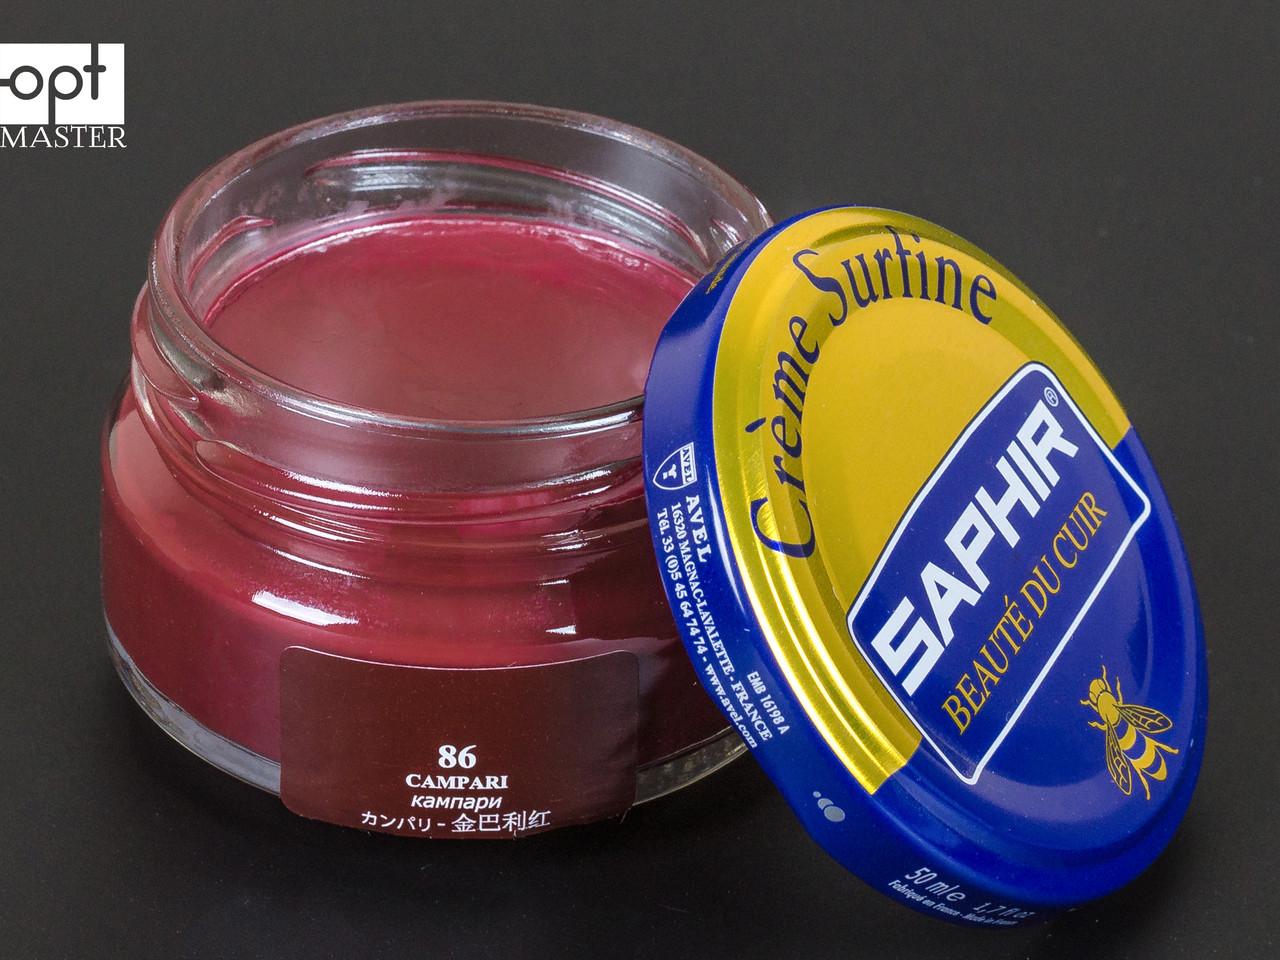 Увлажняющий крем для обуви Saphir Creme Surfine, цв. кампари (86), 50 мл (0032)